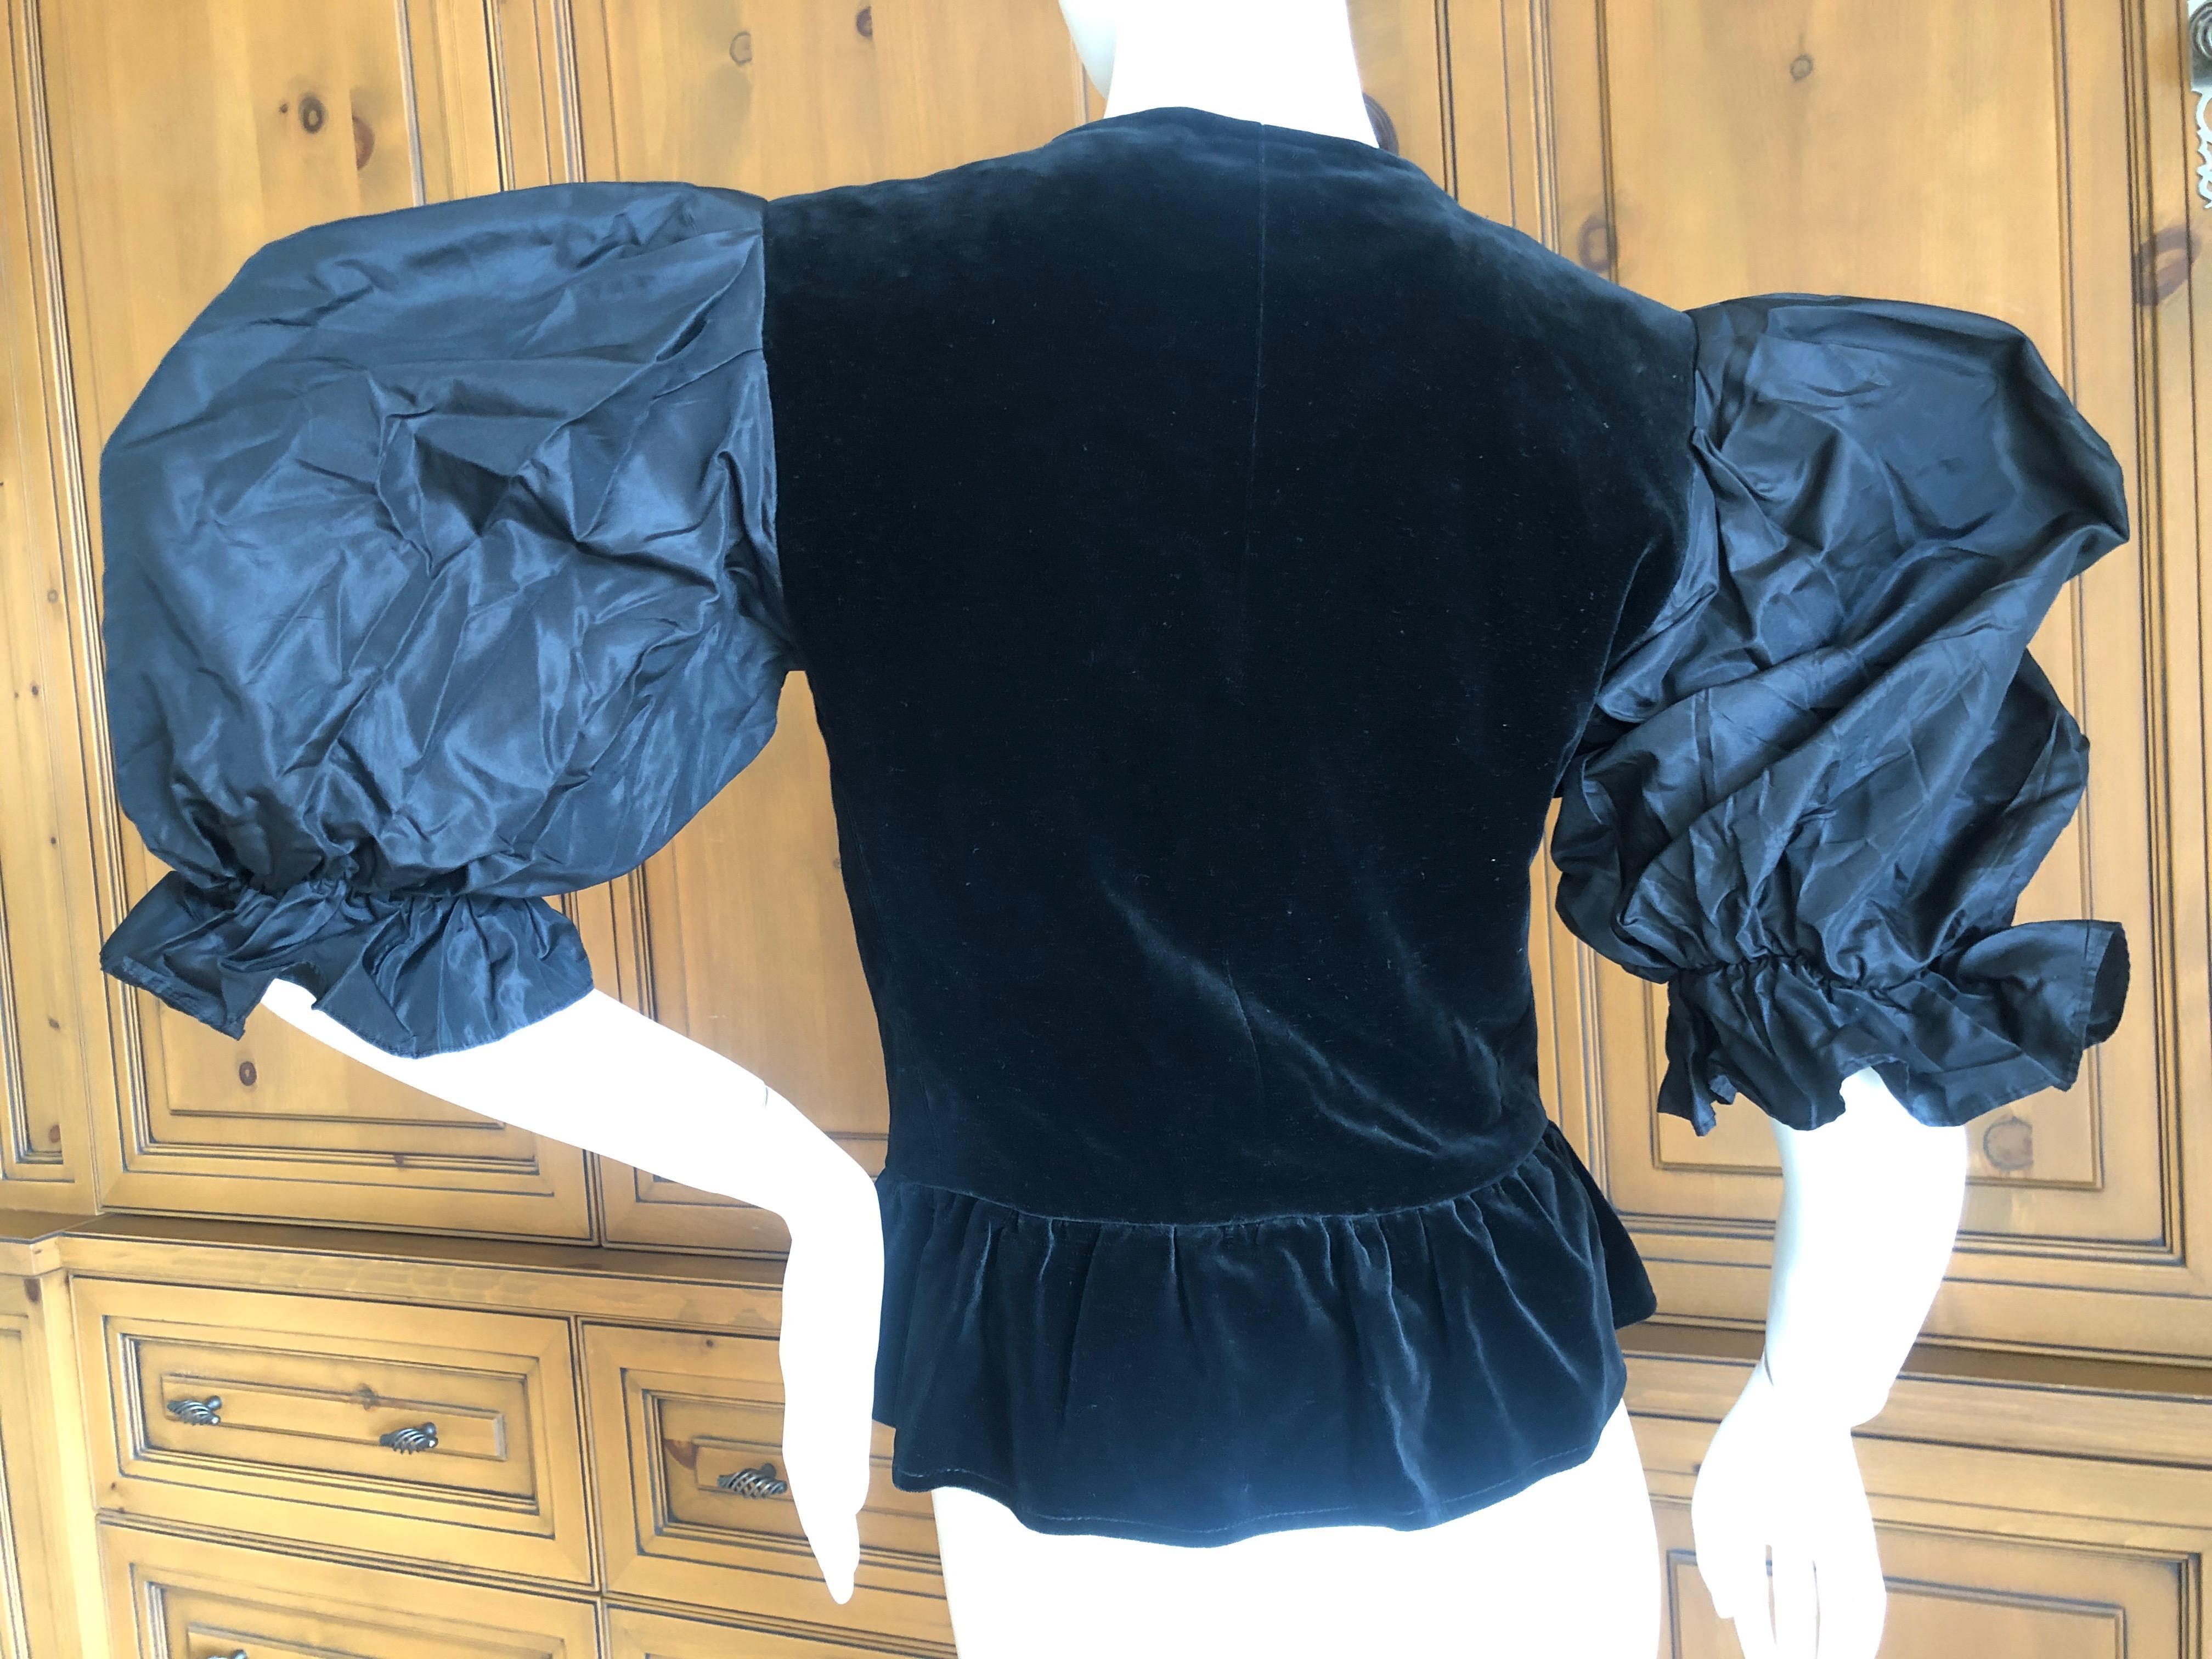 3a83e67db8a Yves Saint Laurent Rive Gauche 1970's Black Velvet Top w Taffeta Balloon  Sleeves For Sale at 1stdibs